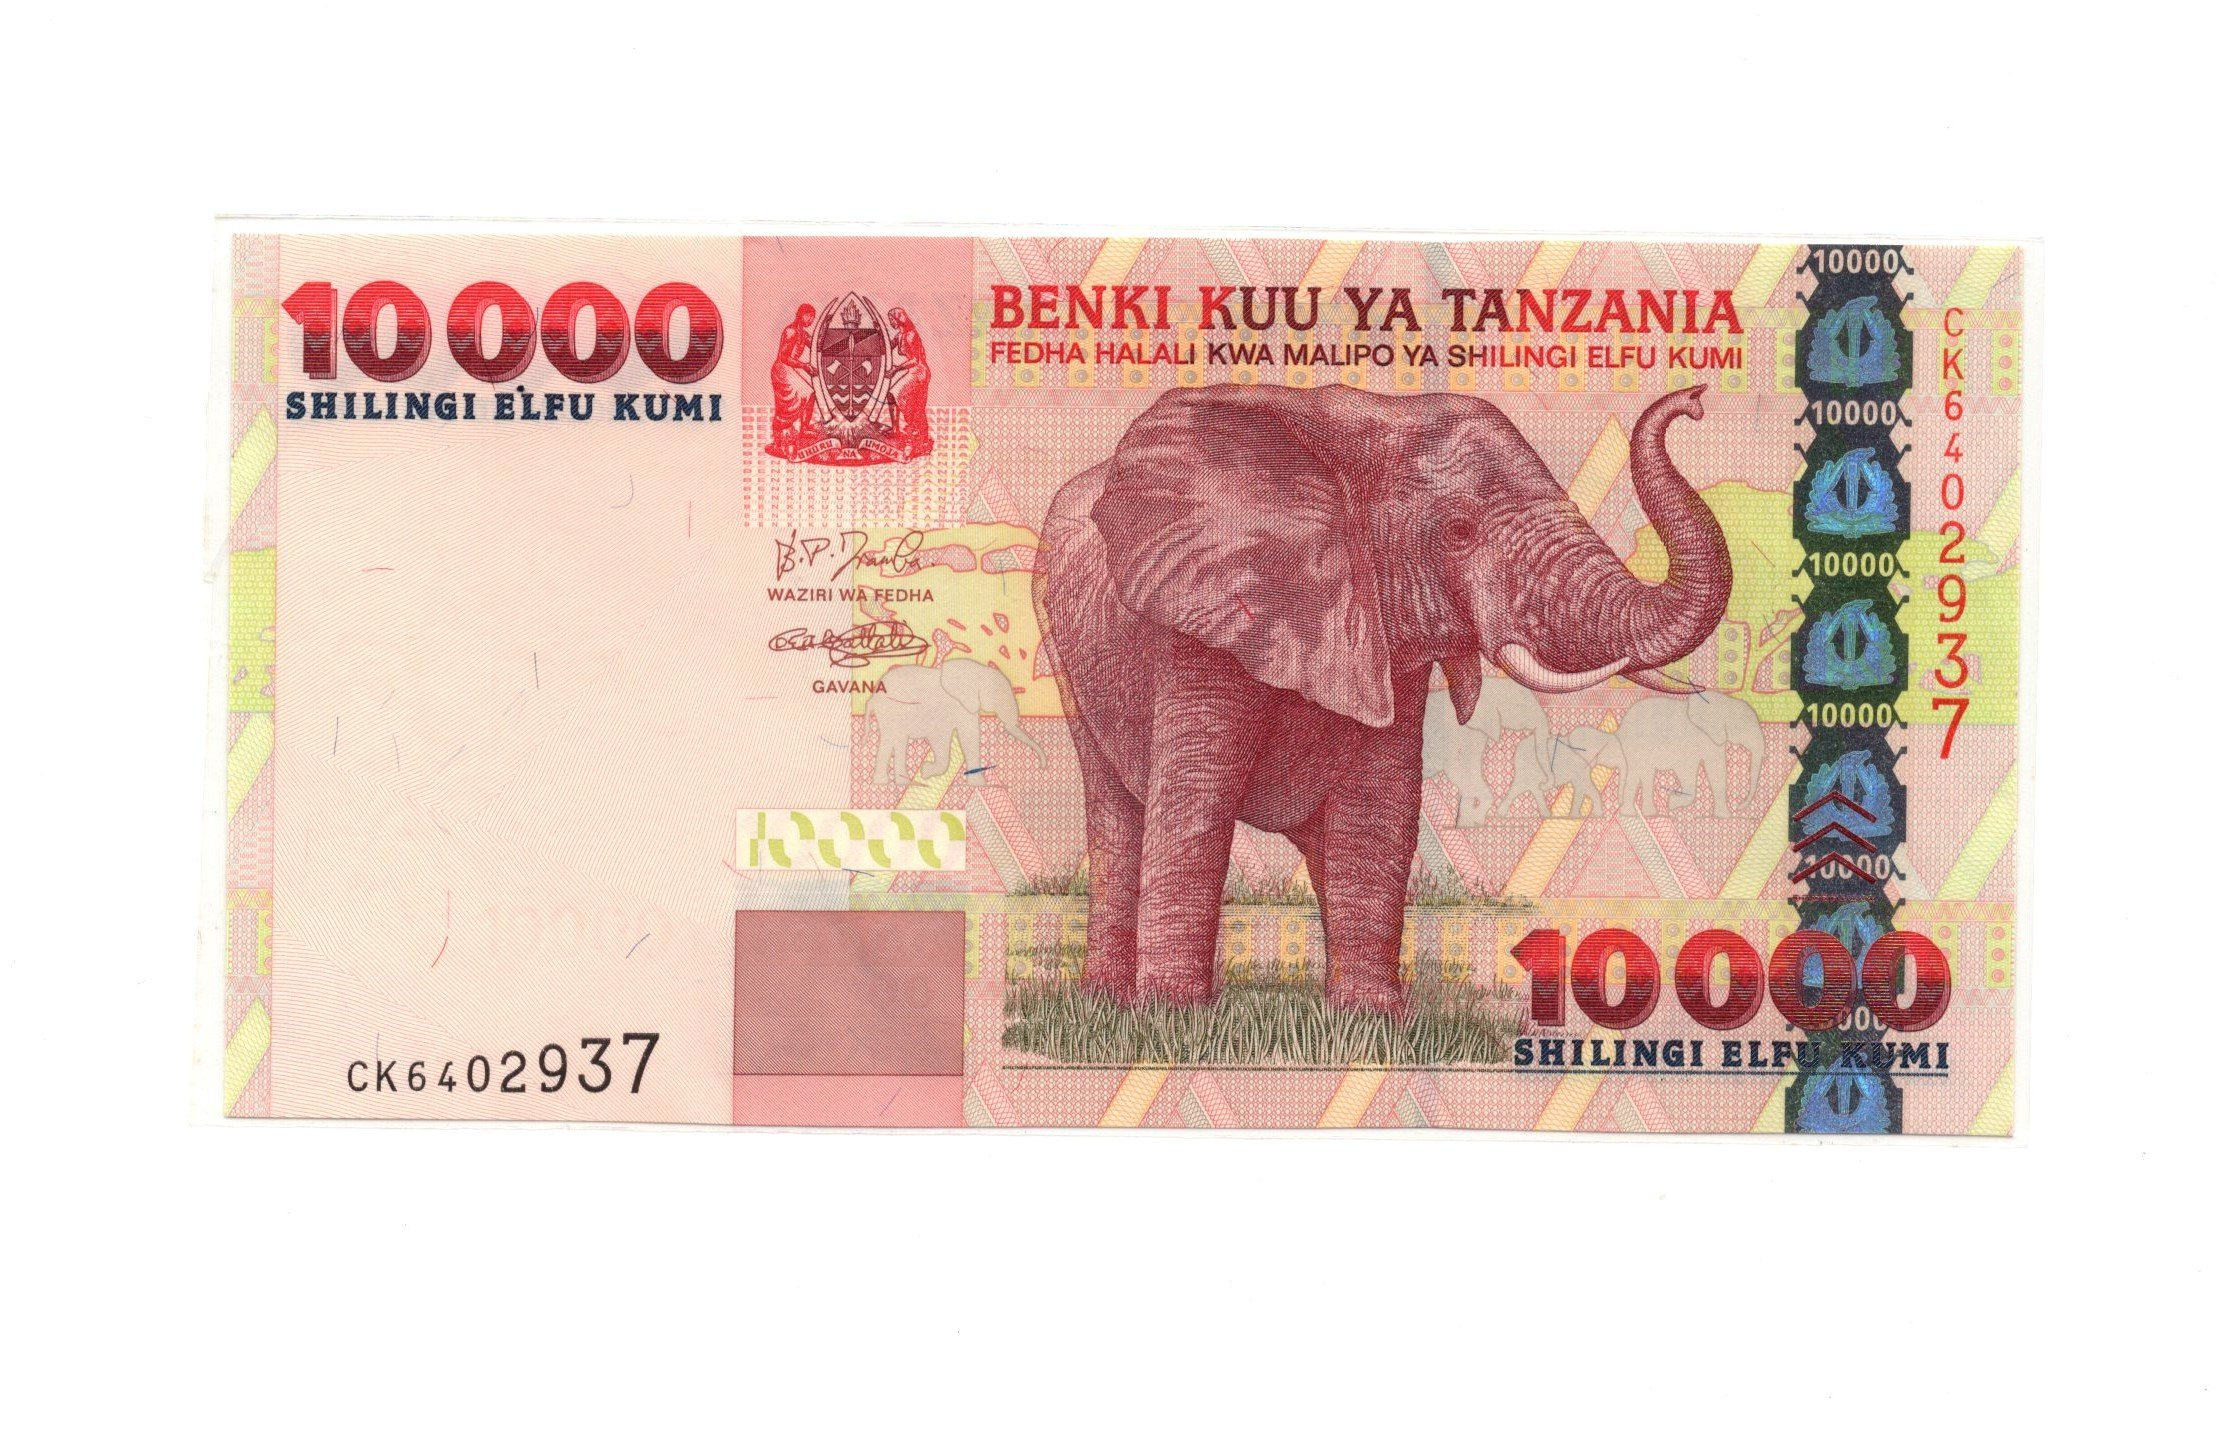 tanzania 10000 shillings